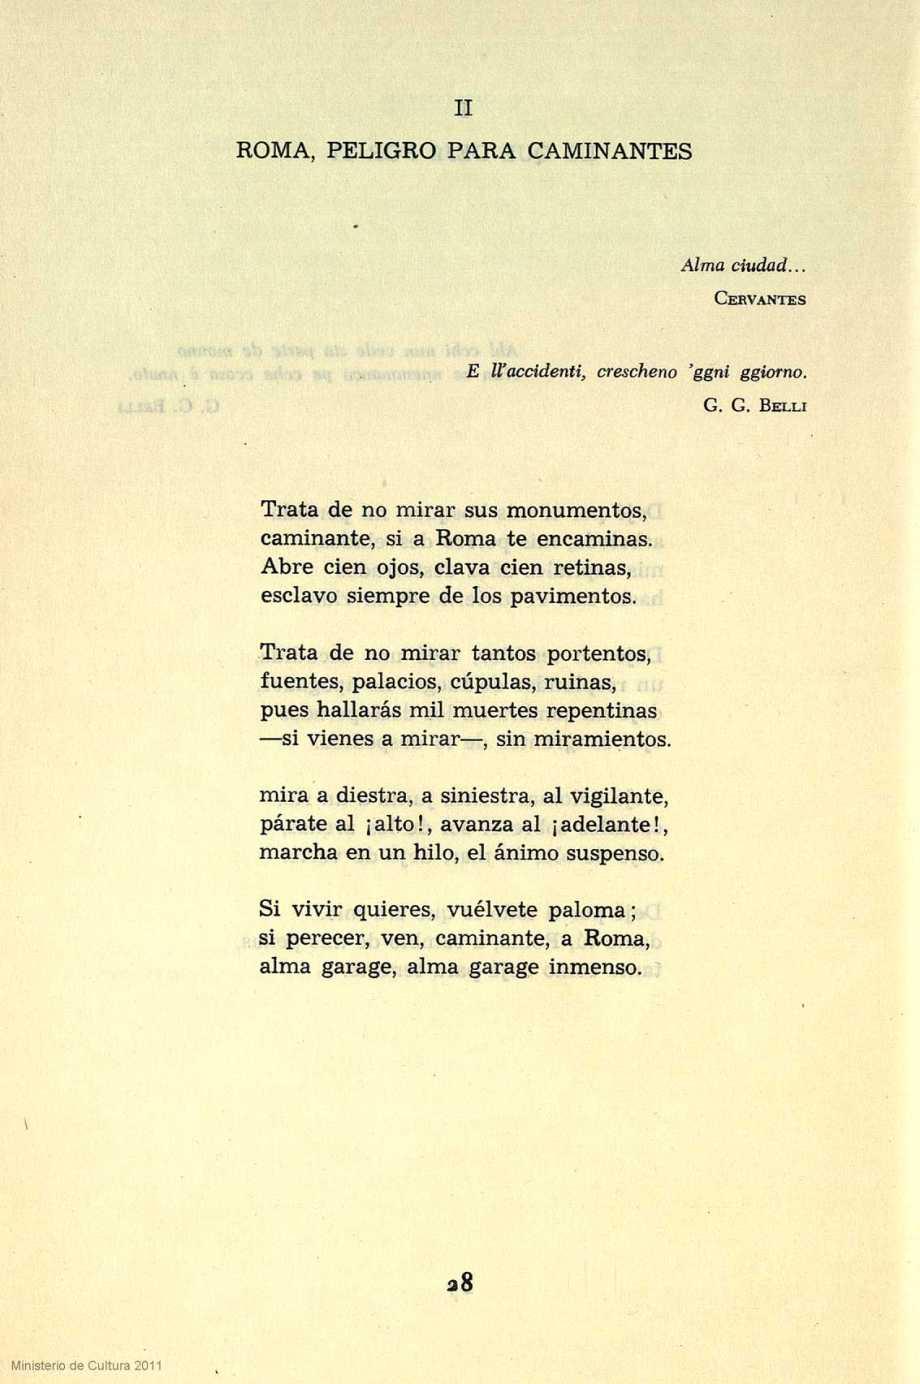 Alberti soneto Roma, peligro para caminantes